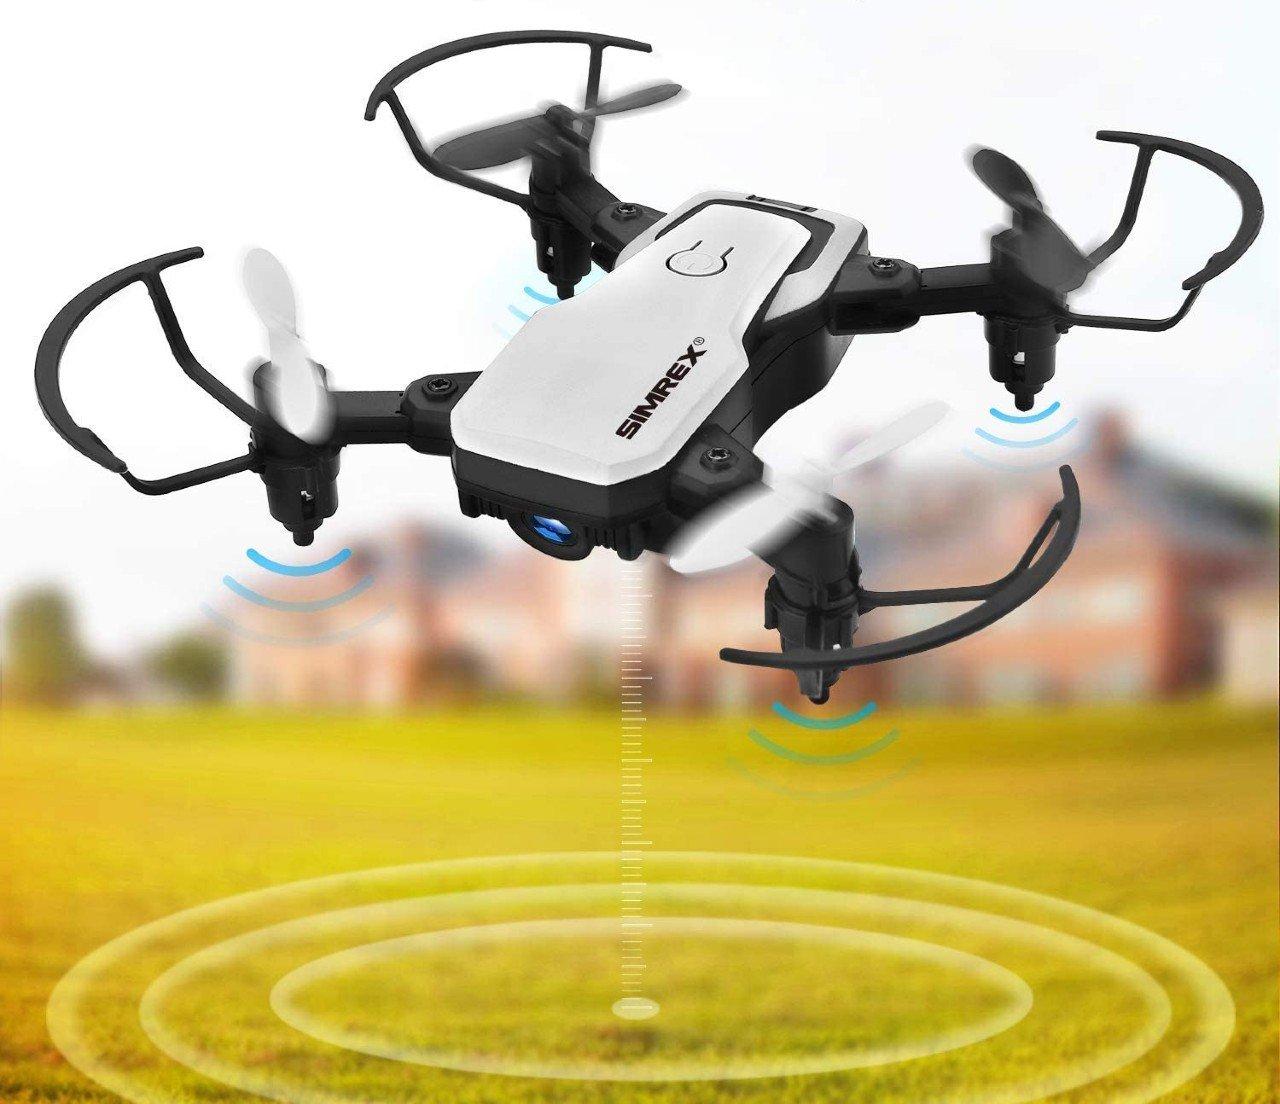 simrex-x300c-drone-under-50-dollars